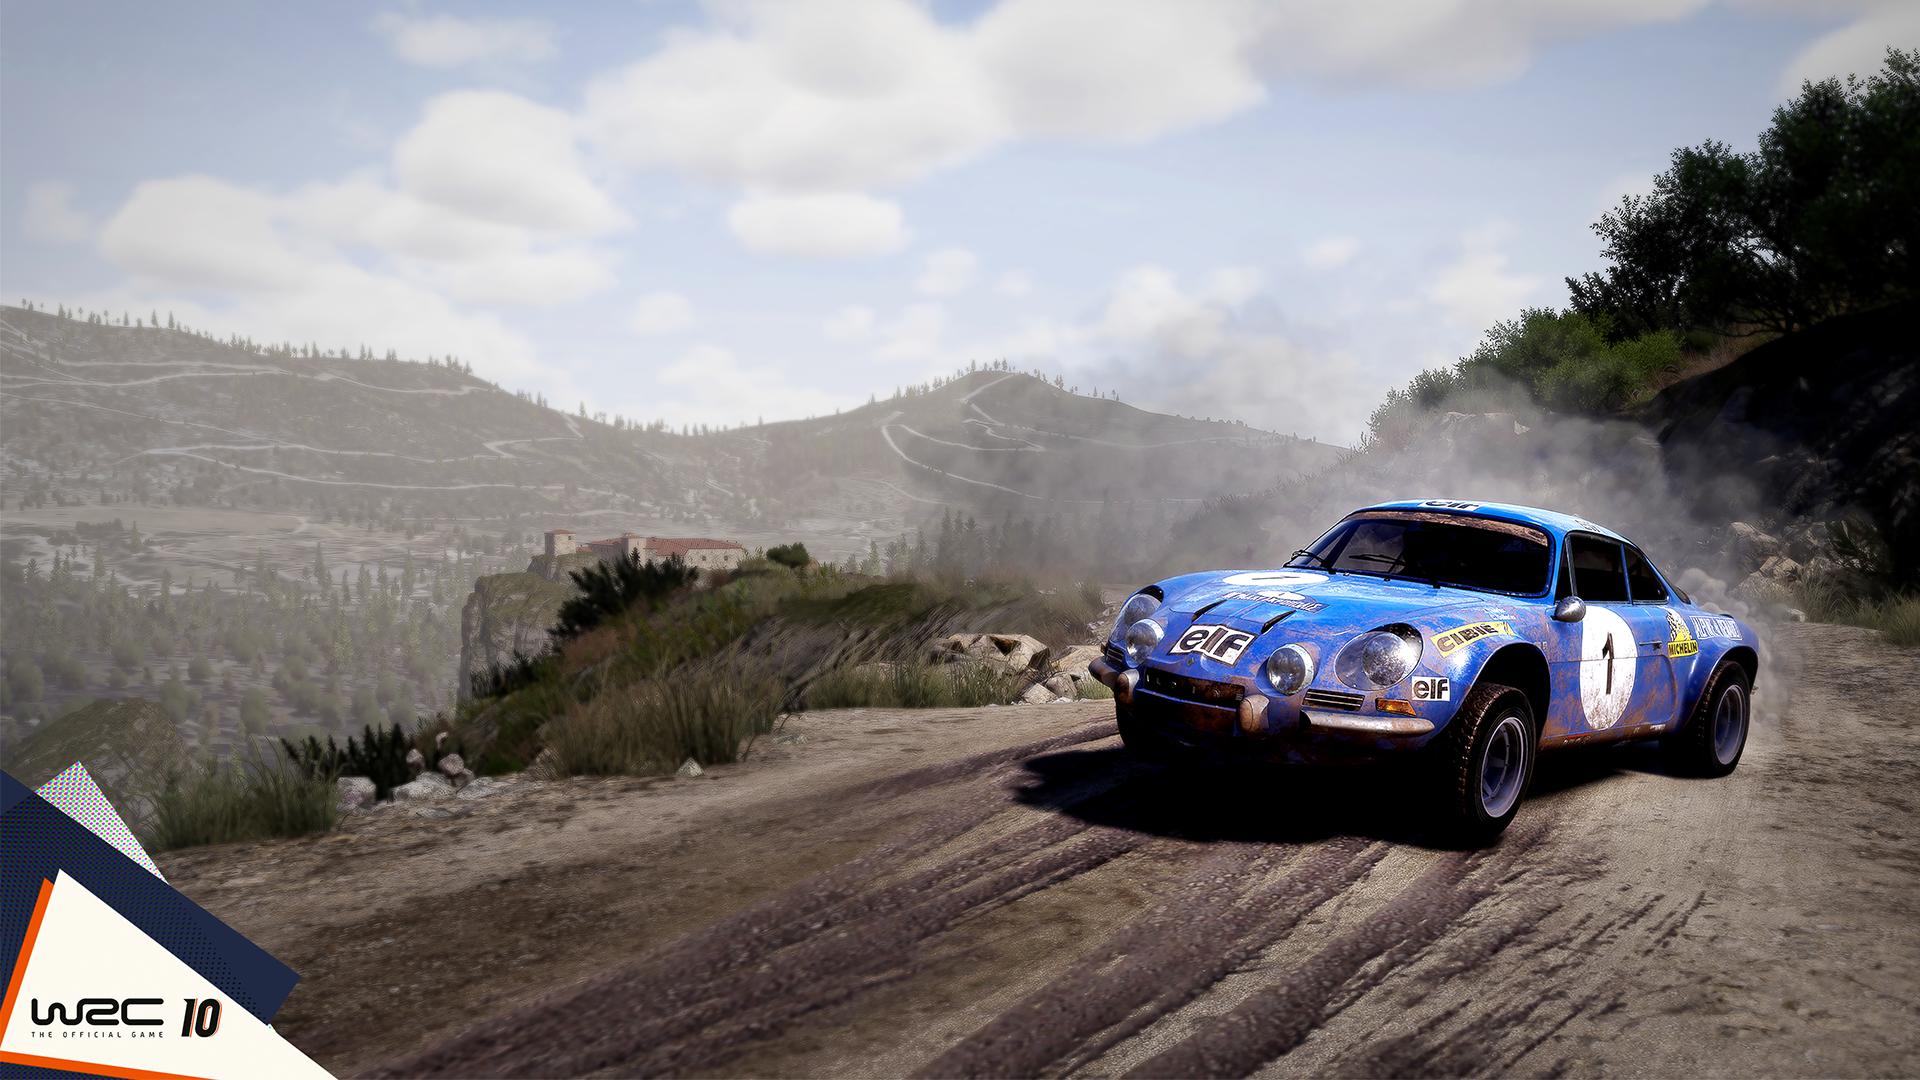 WRC 10 video game celebrates 50 years of WRC